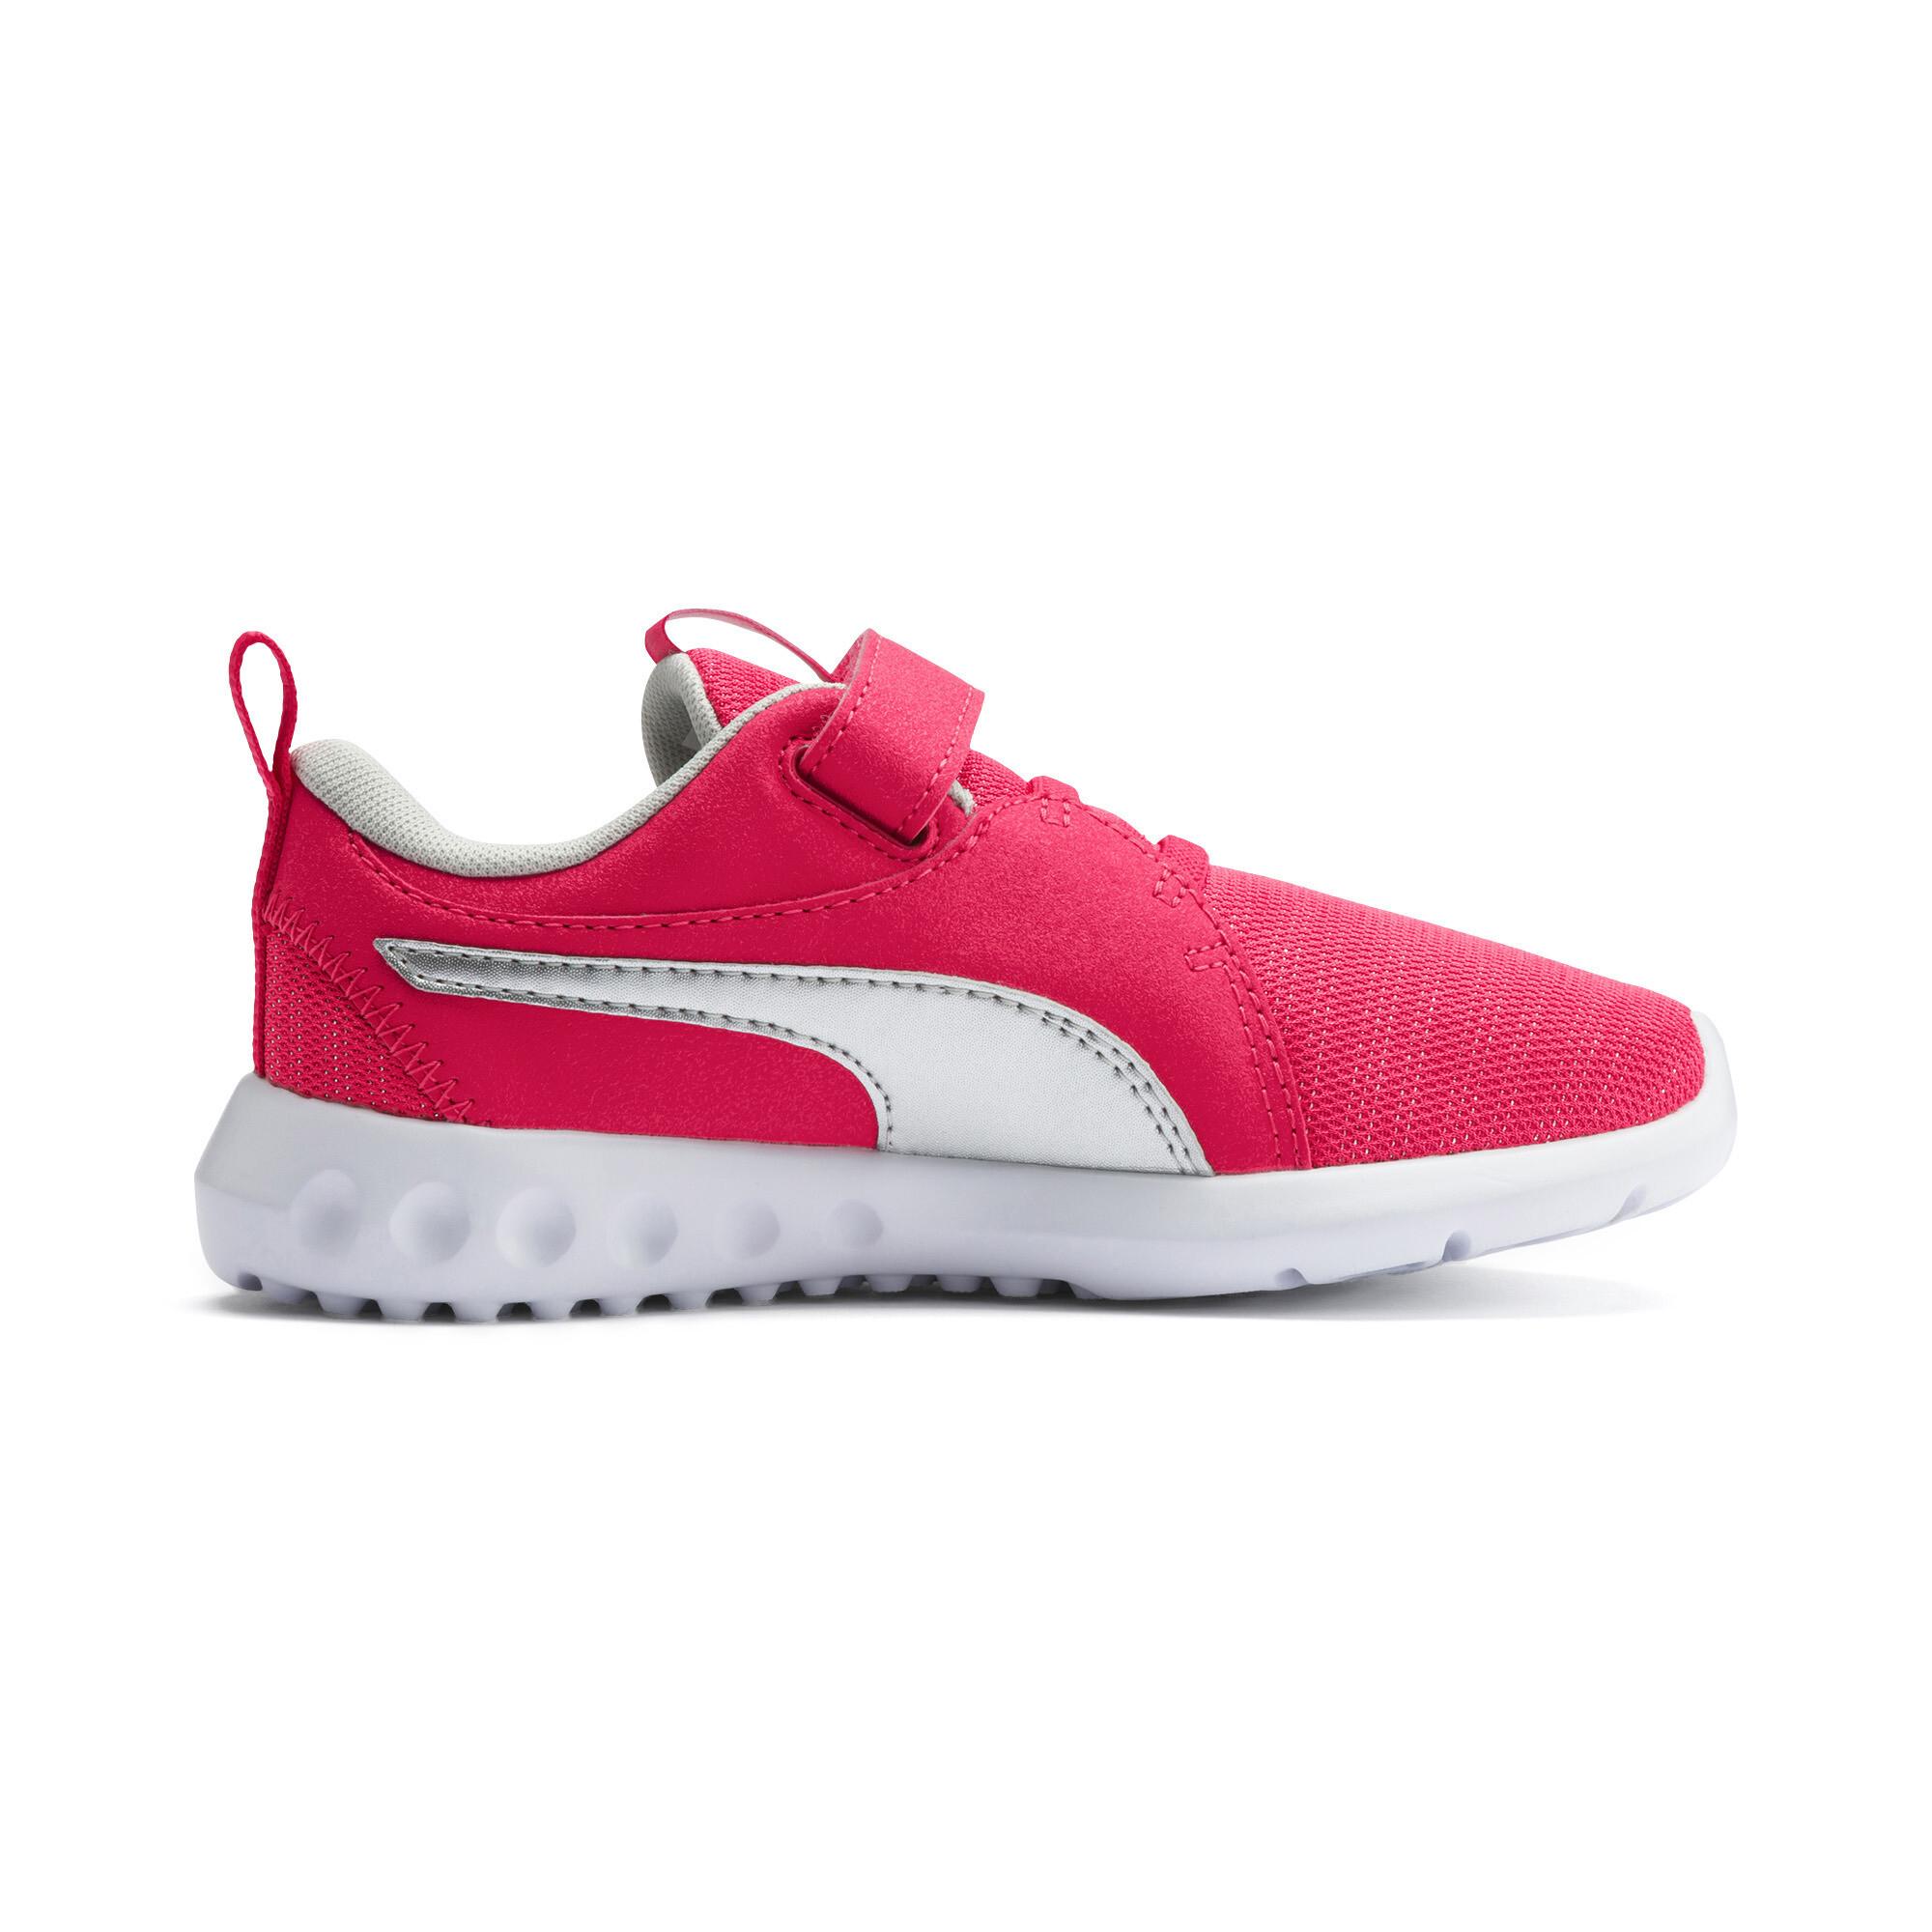 PUMA-Carson-2-Glitz-AC-Shoes-PS-Girls-Shoe-Kids thumbnail 6